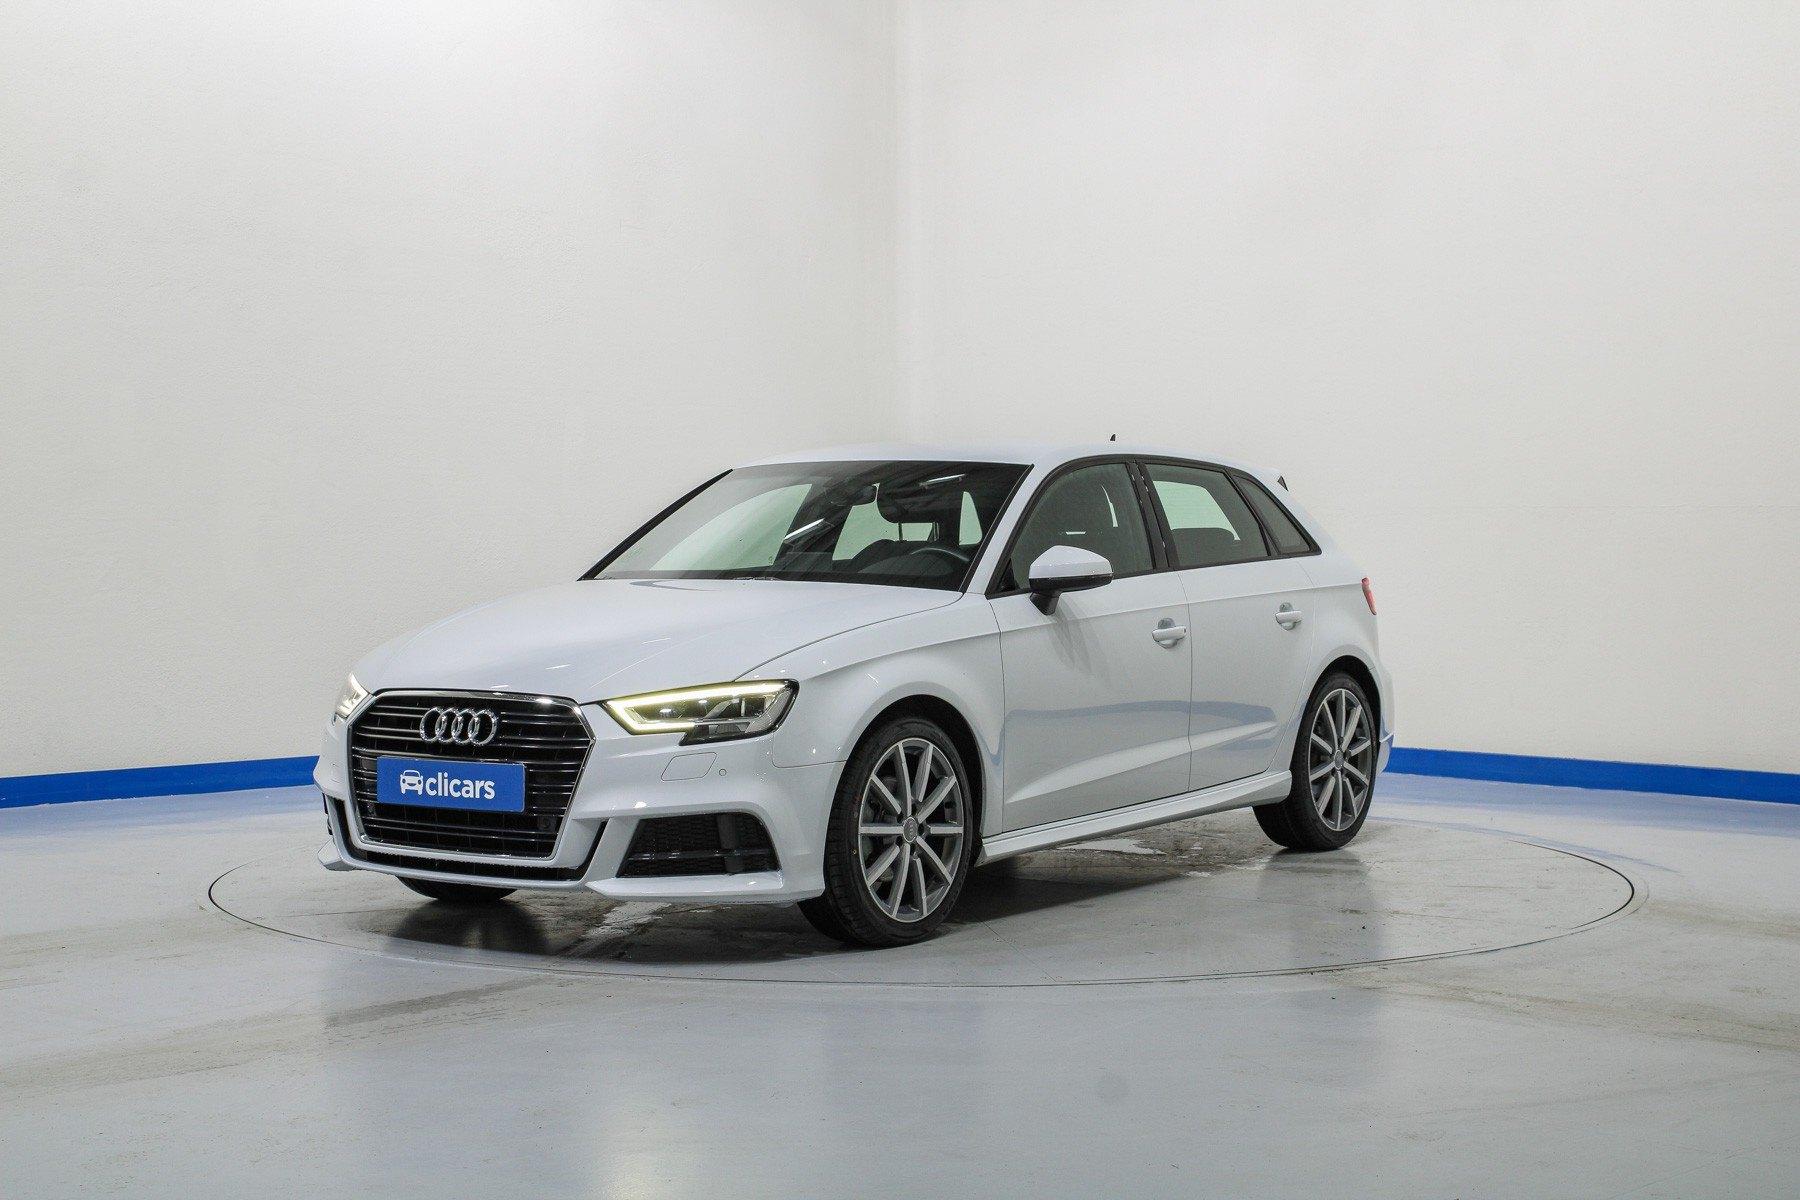 Audi A3 Gasolina S line 30 TFSI 85kW (116CV) Sportback 1